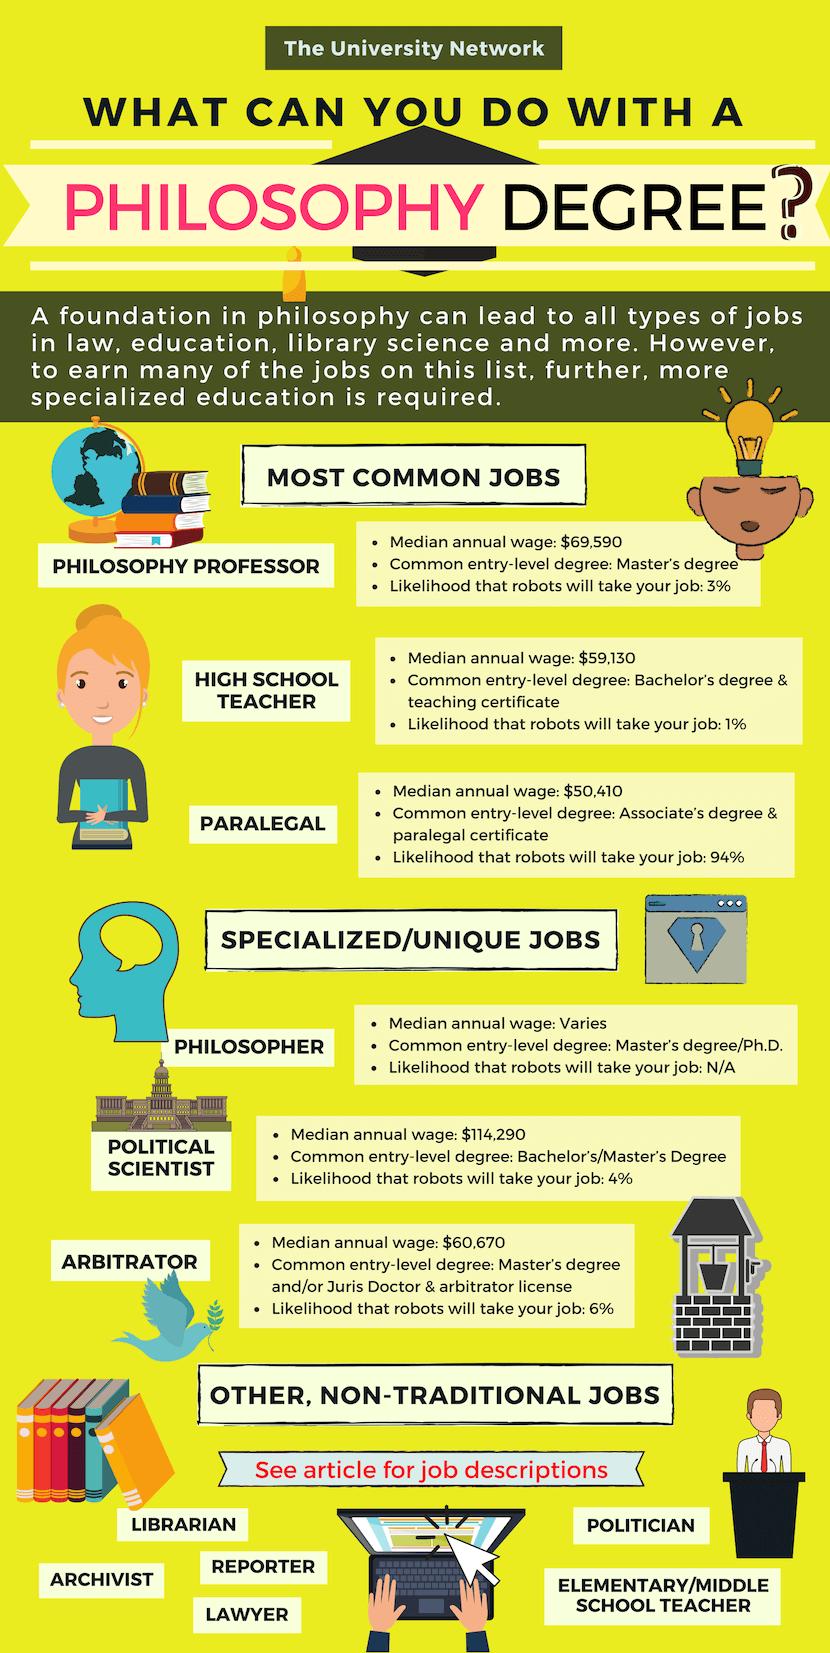 6e15611c8af5a5d576c1f11902ad7238 - How To Get A Job With A Physics Degree